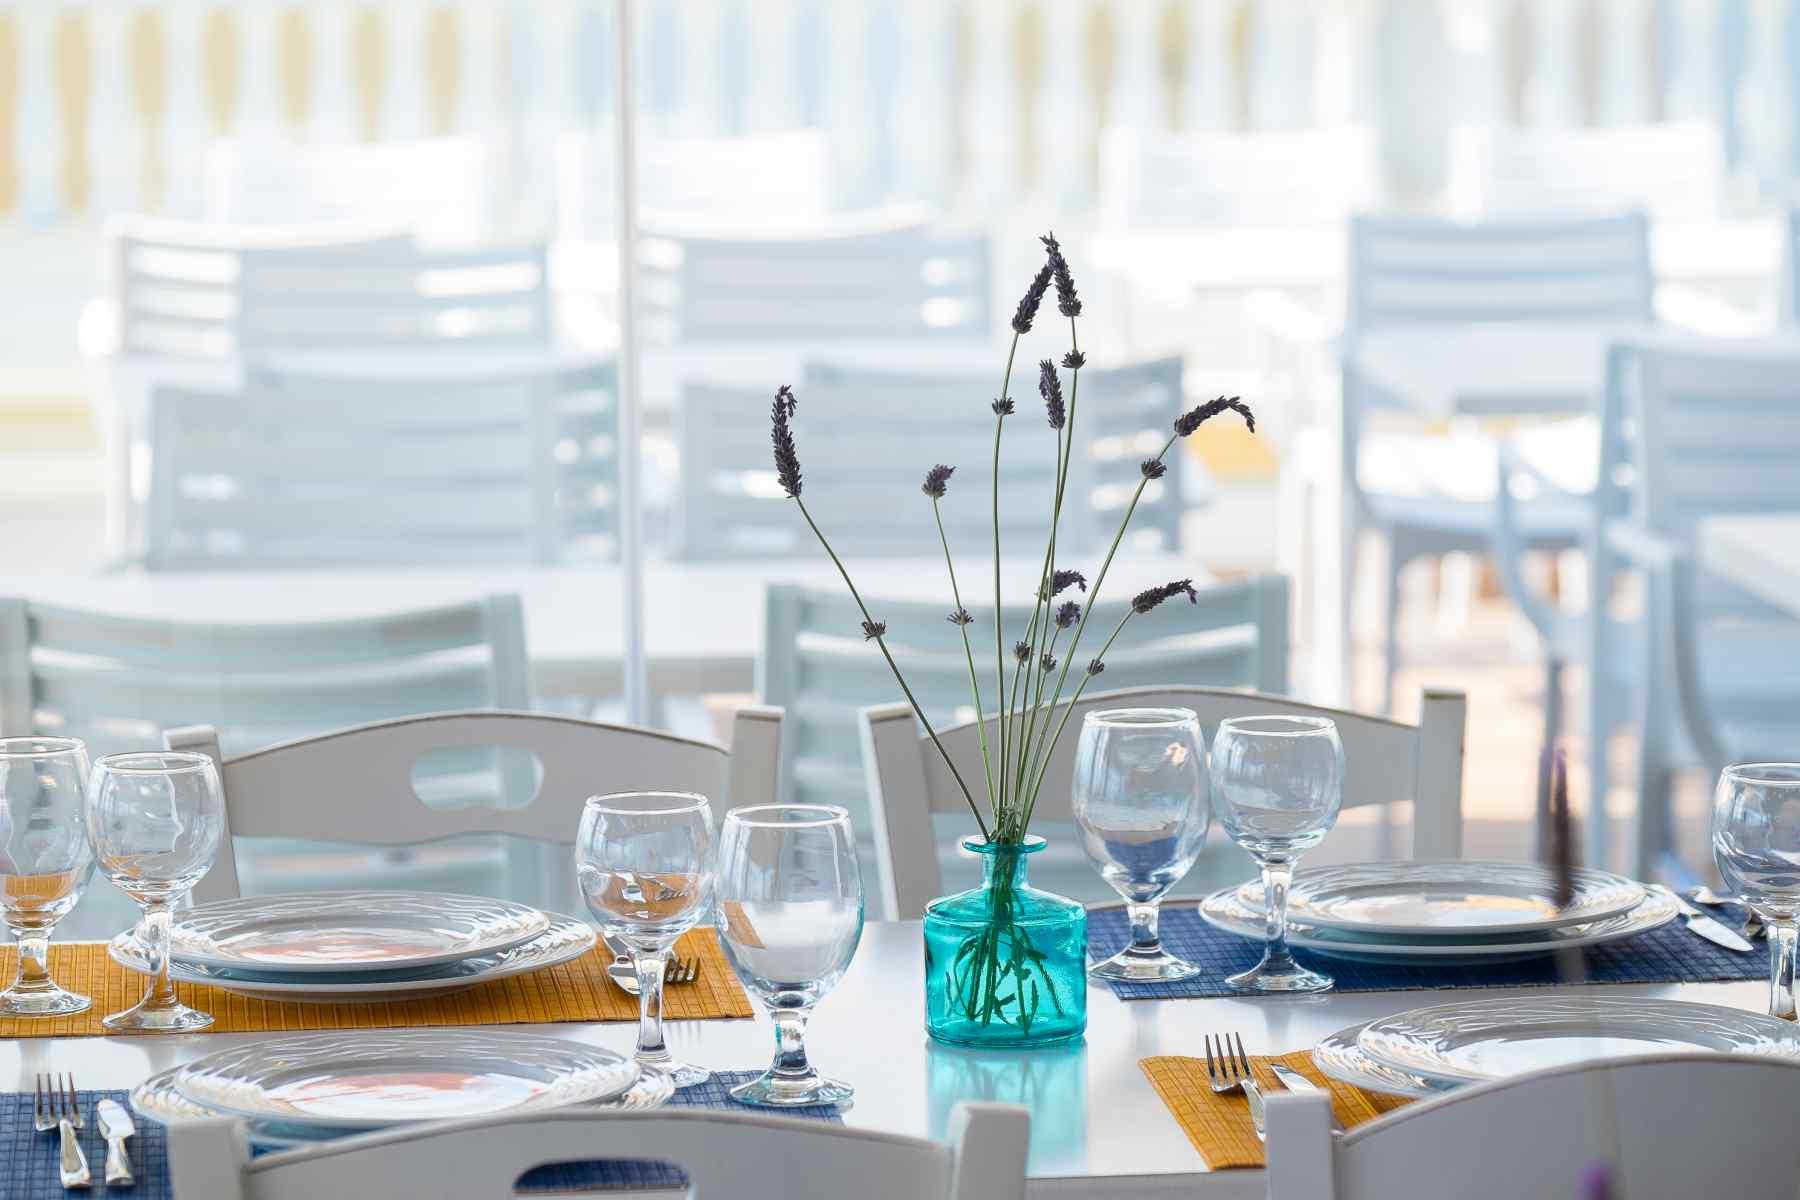 Must Boutique Hotel, Ξενοδοχείο στο Κανάλι Πρέβεζας, Απίθανες γεύσεις στο restaurant